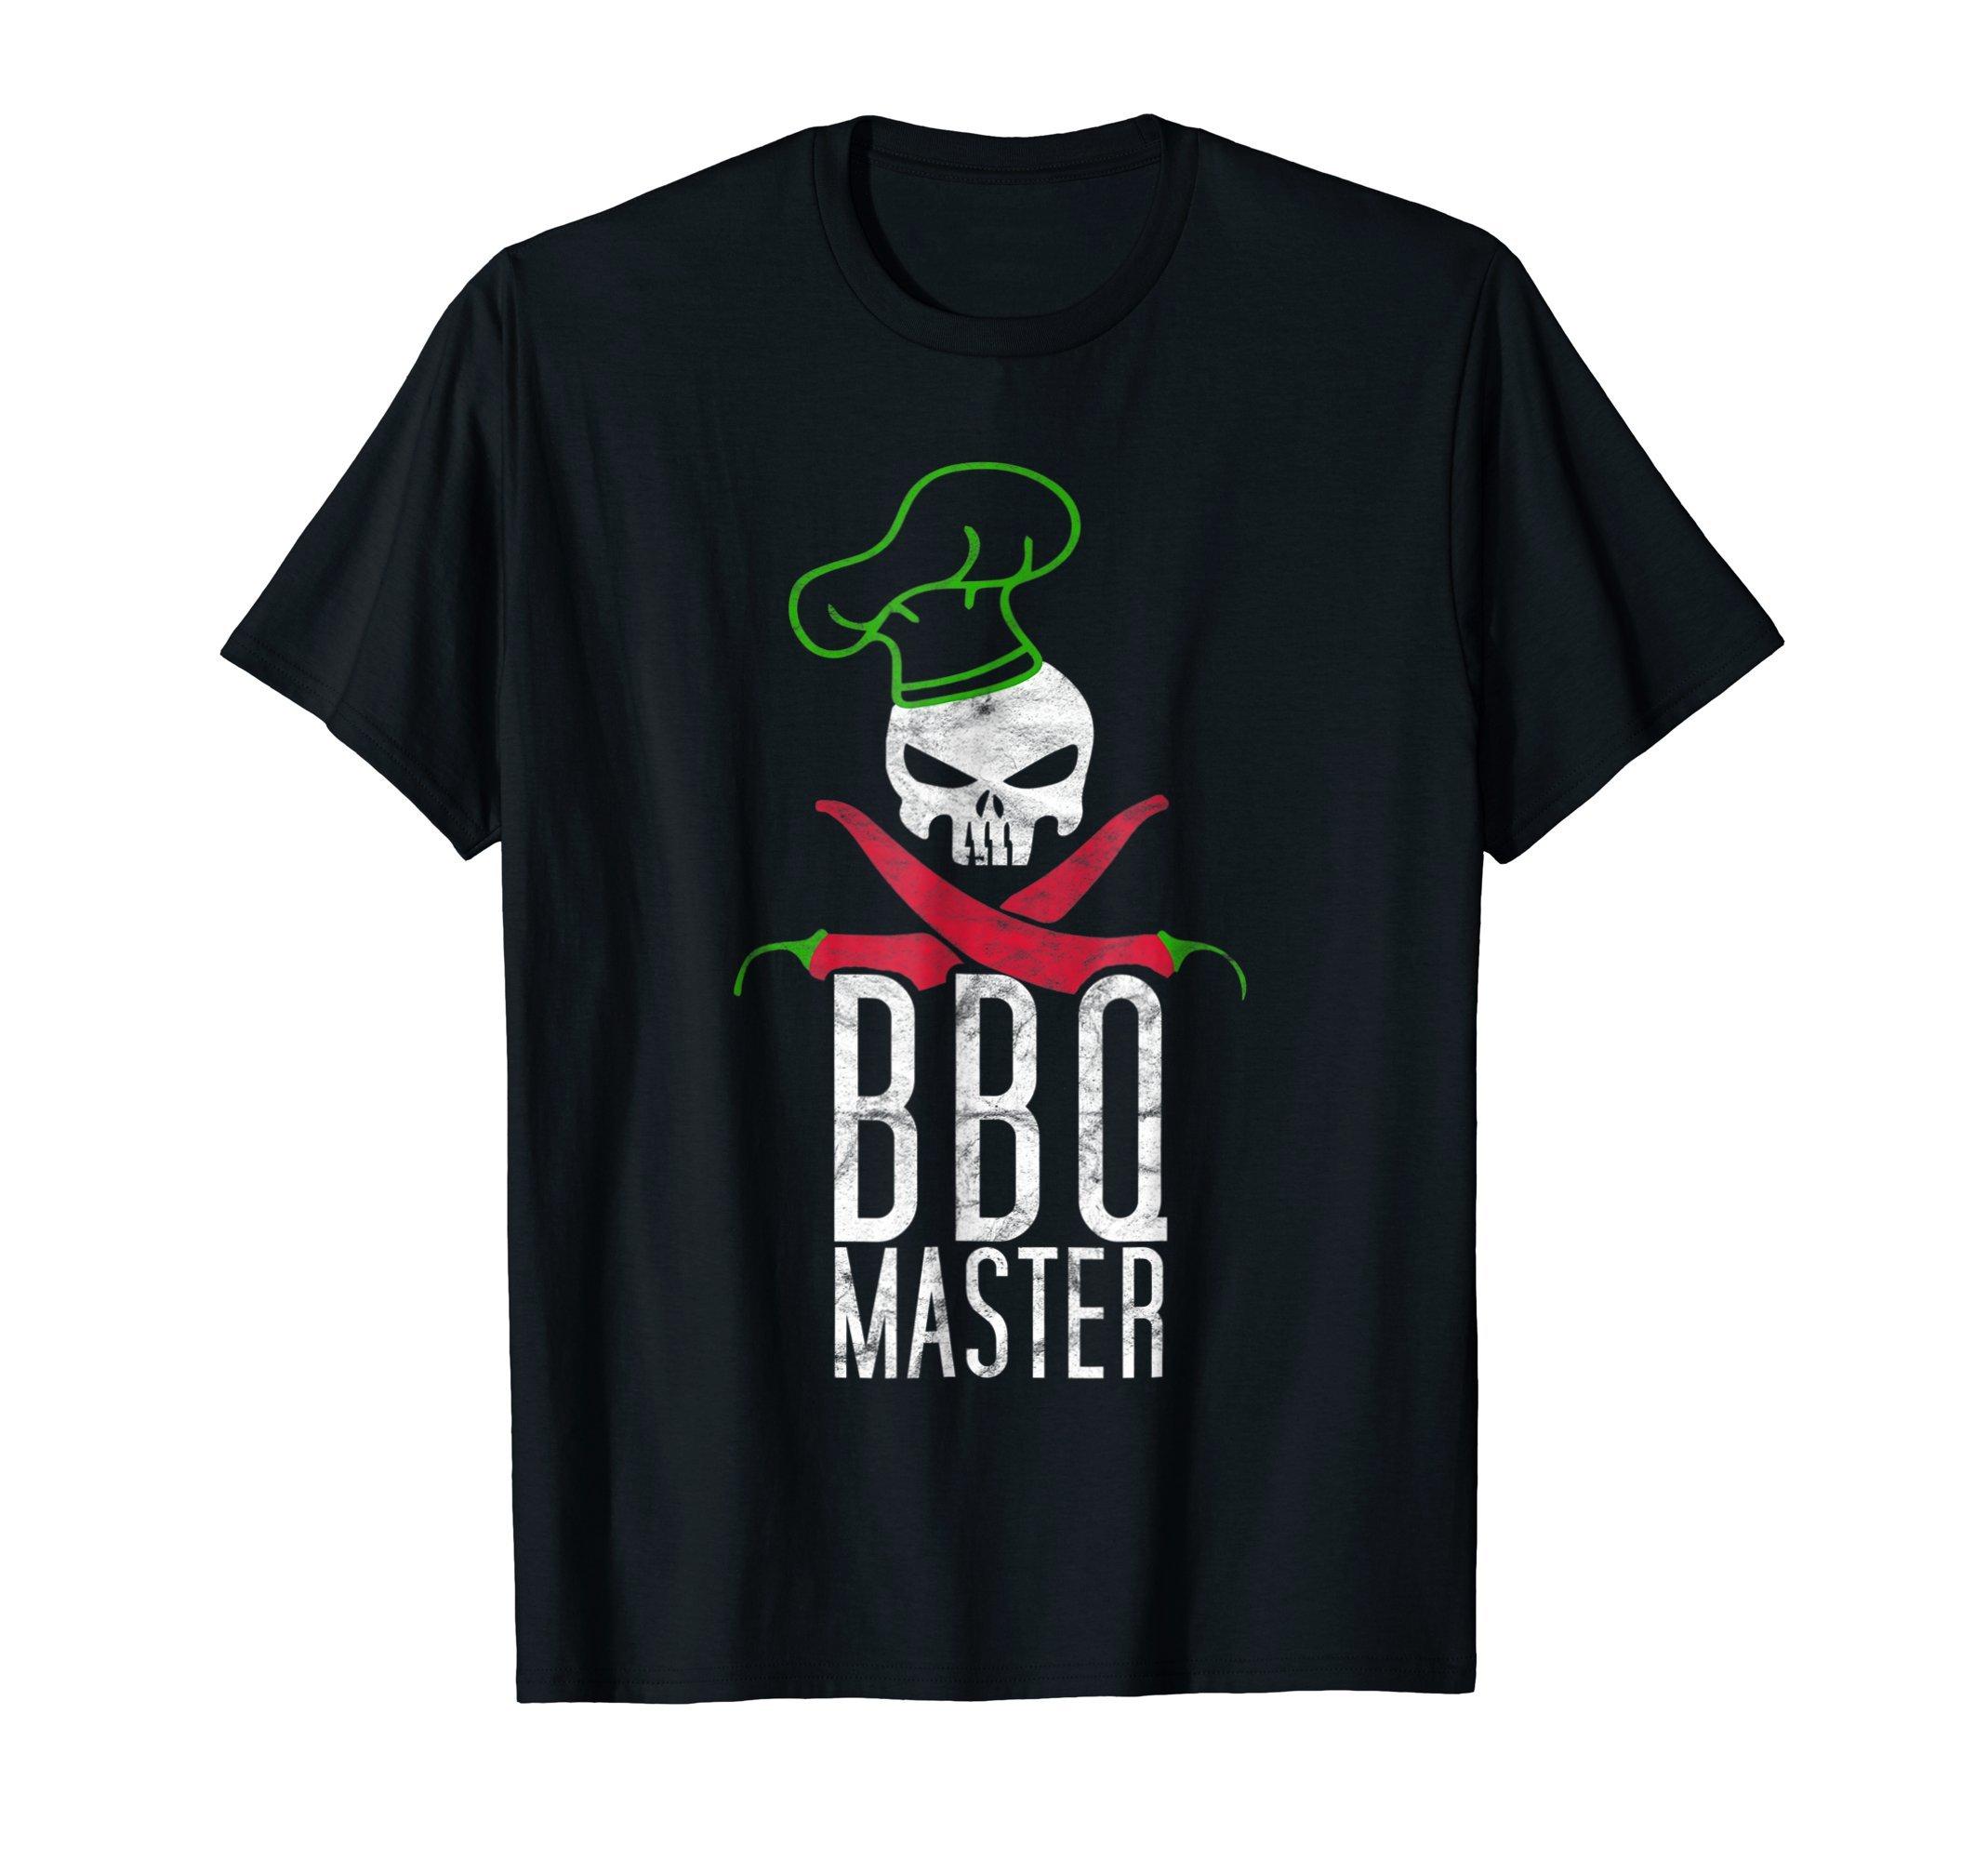 Grill Master BBQ Grilling Hobby T-Shirt Smoker Shirt